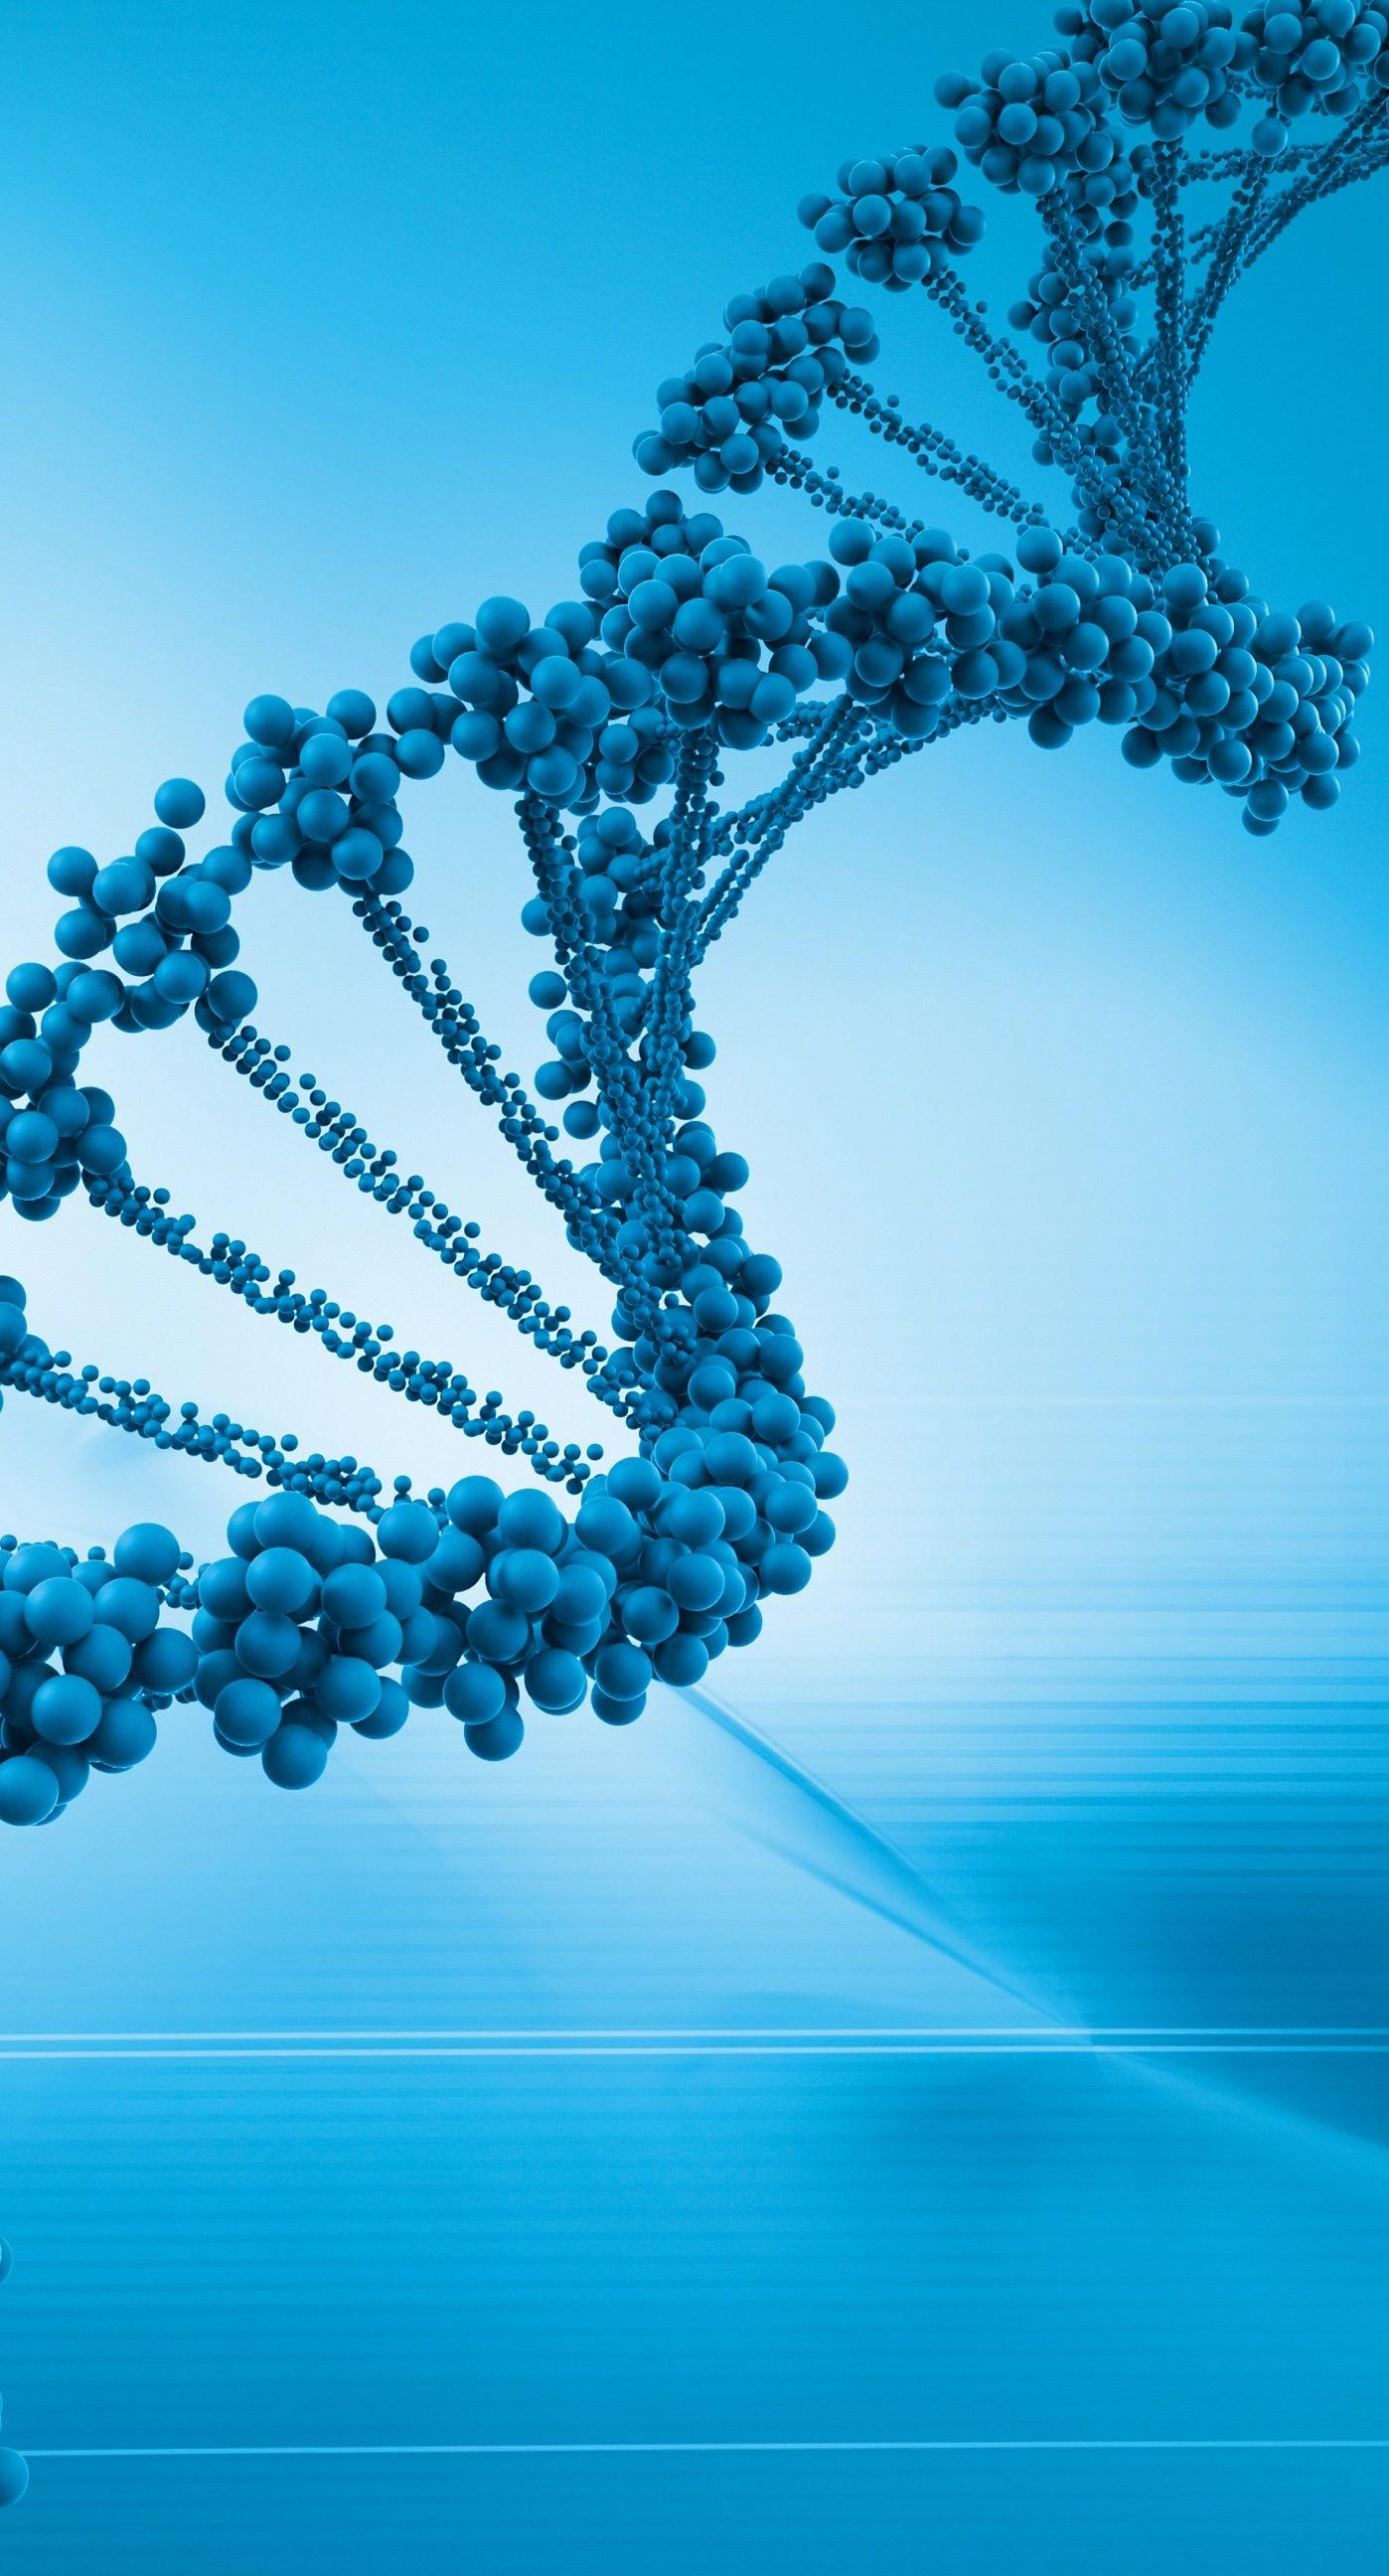 Cool Dna Blue Gene Genome Wallpaper Sc Iphone7plus